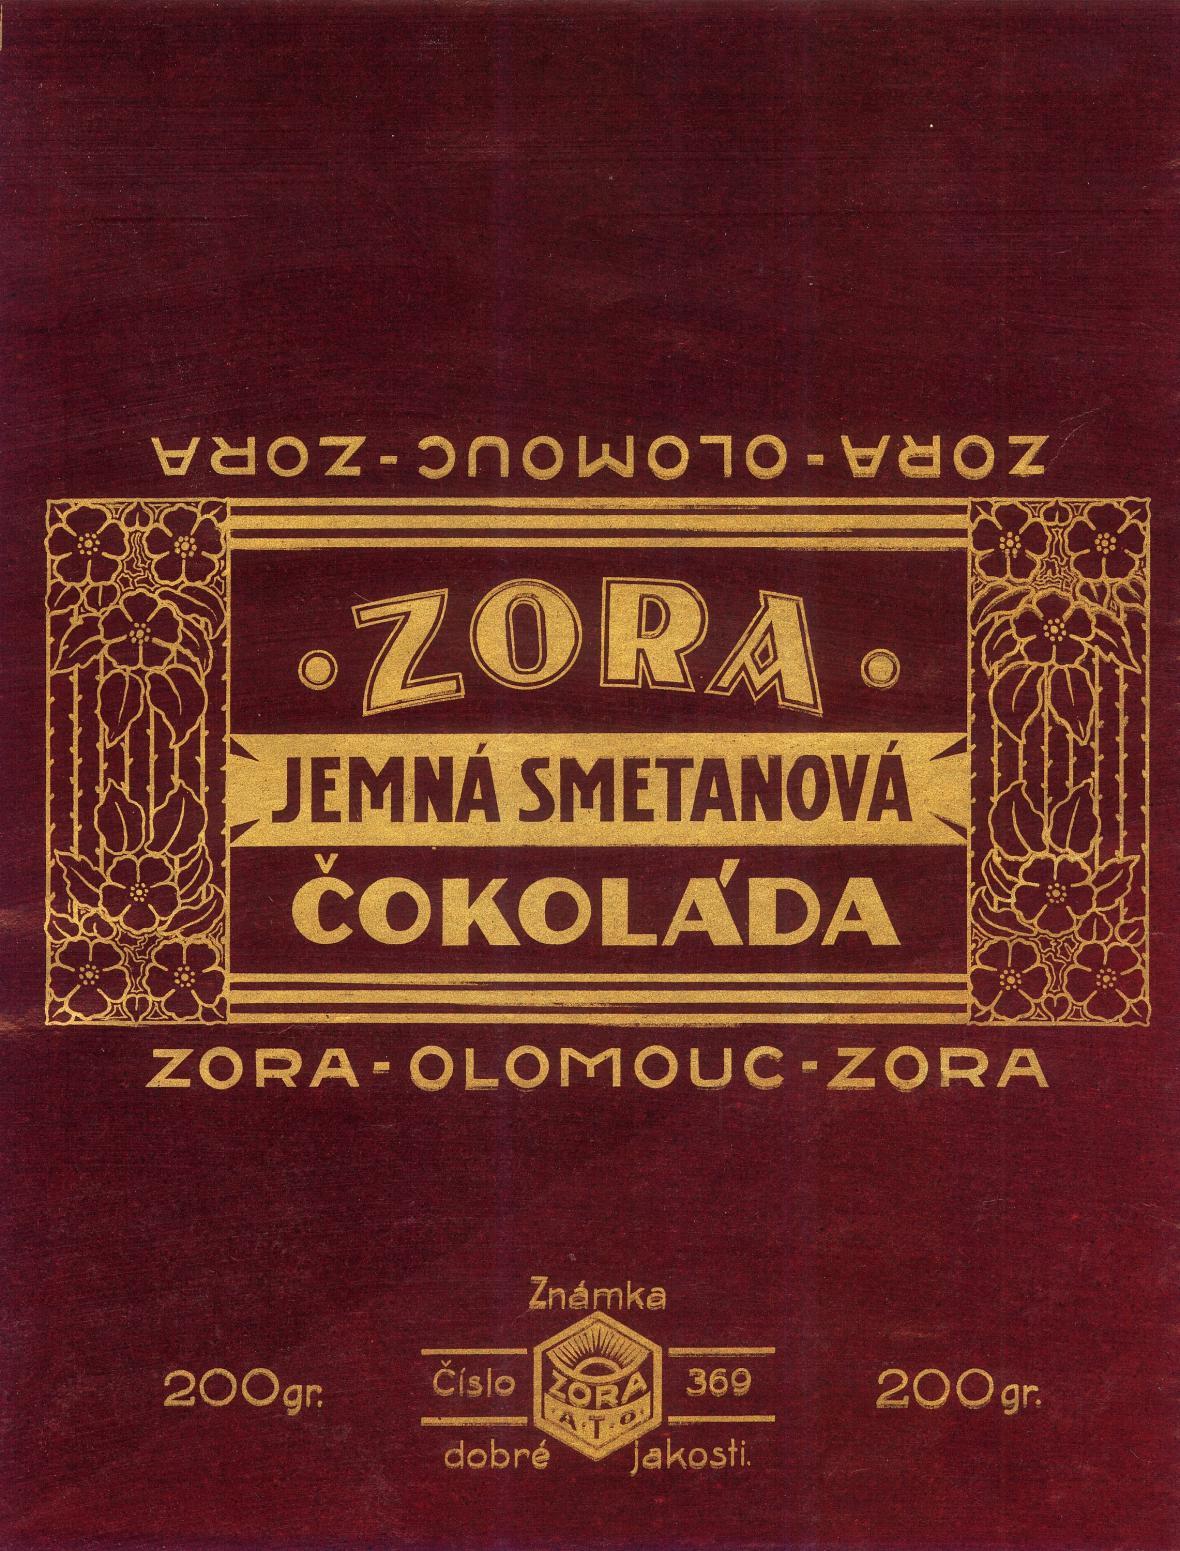 Obal na čokoládu Zora